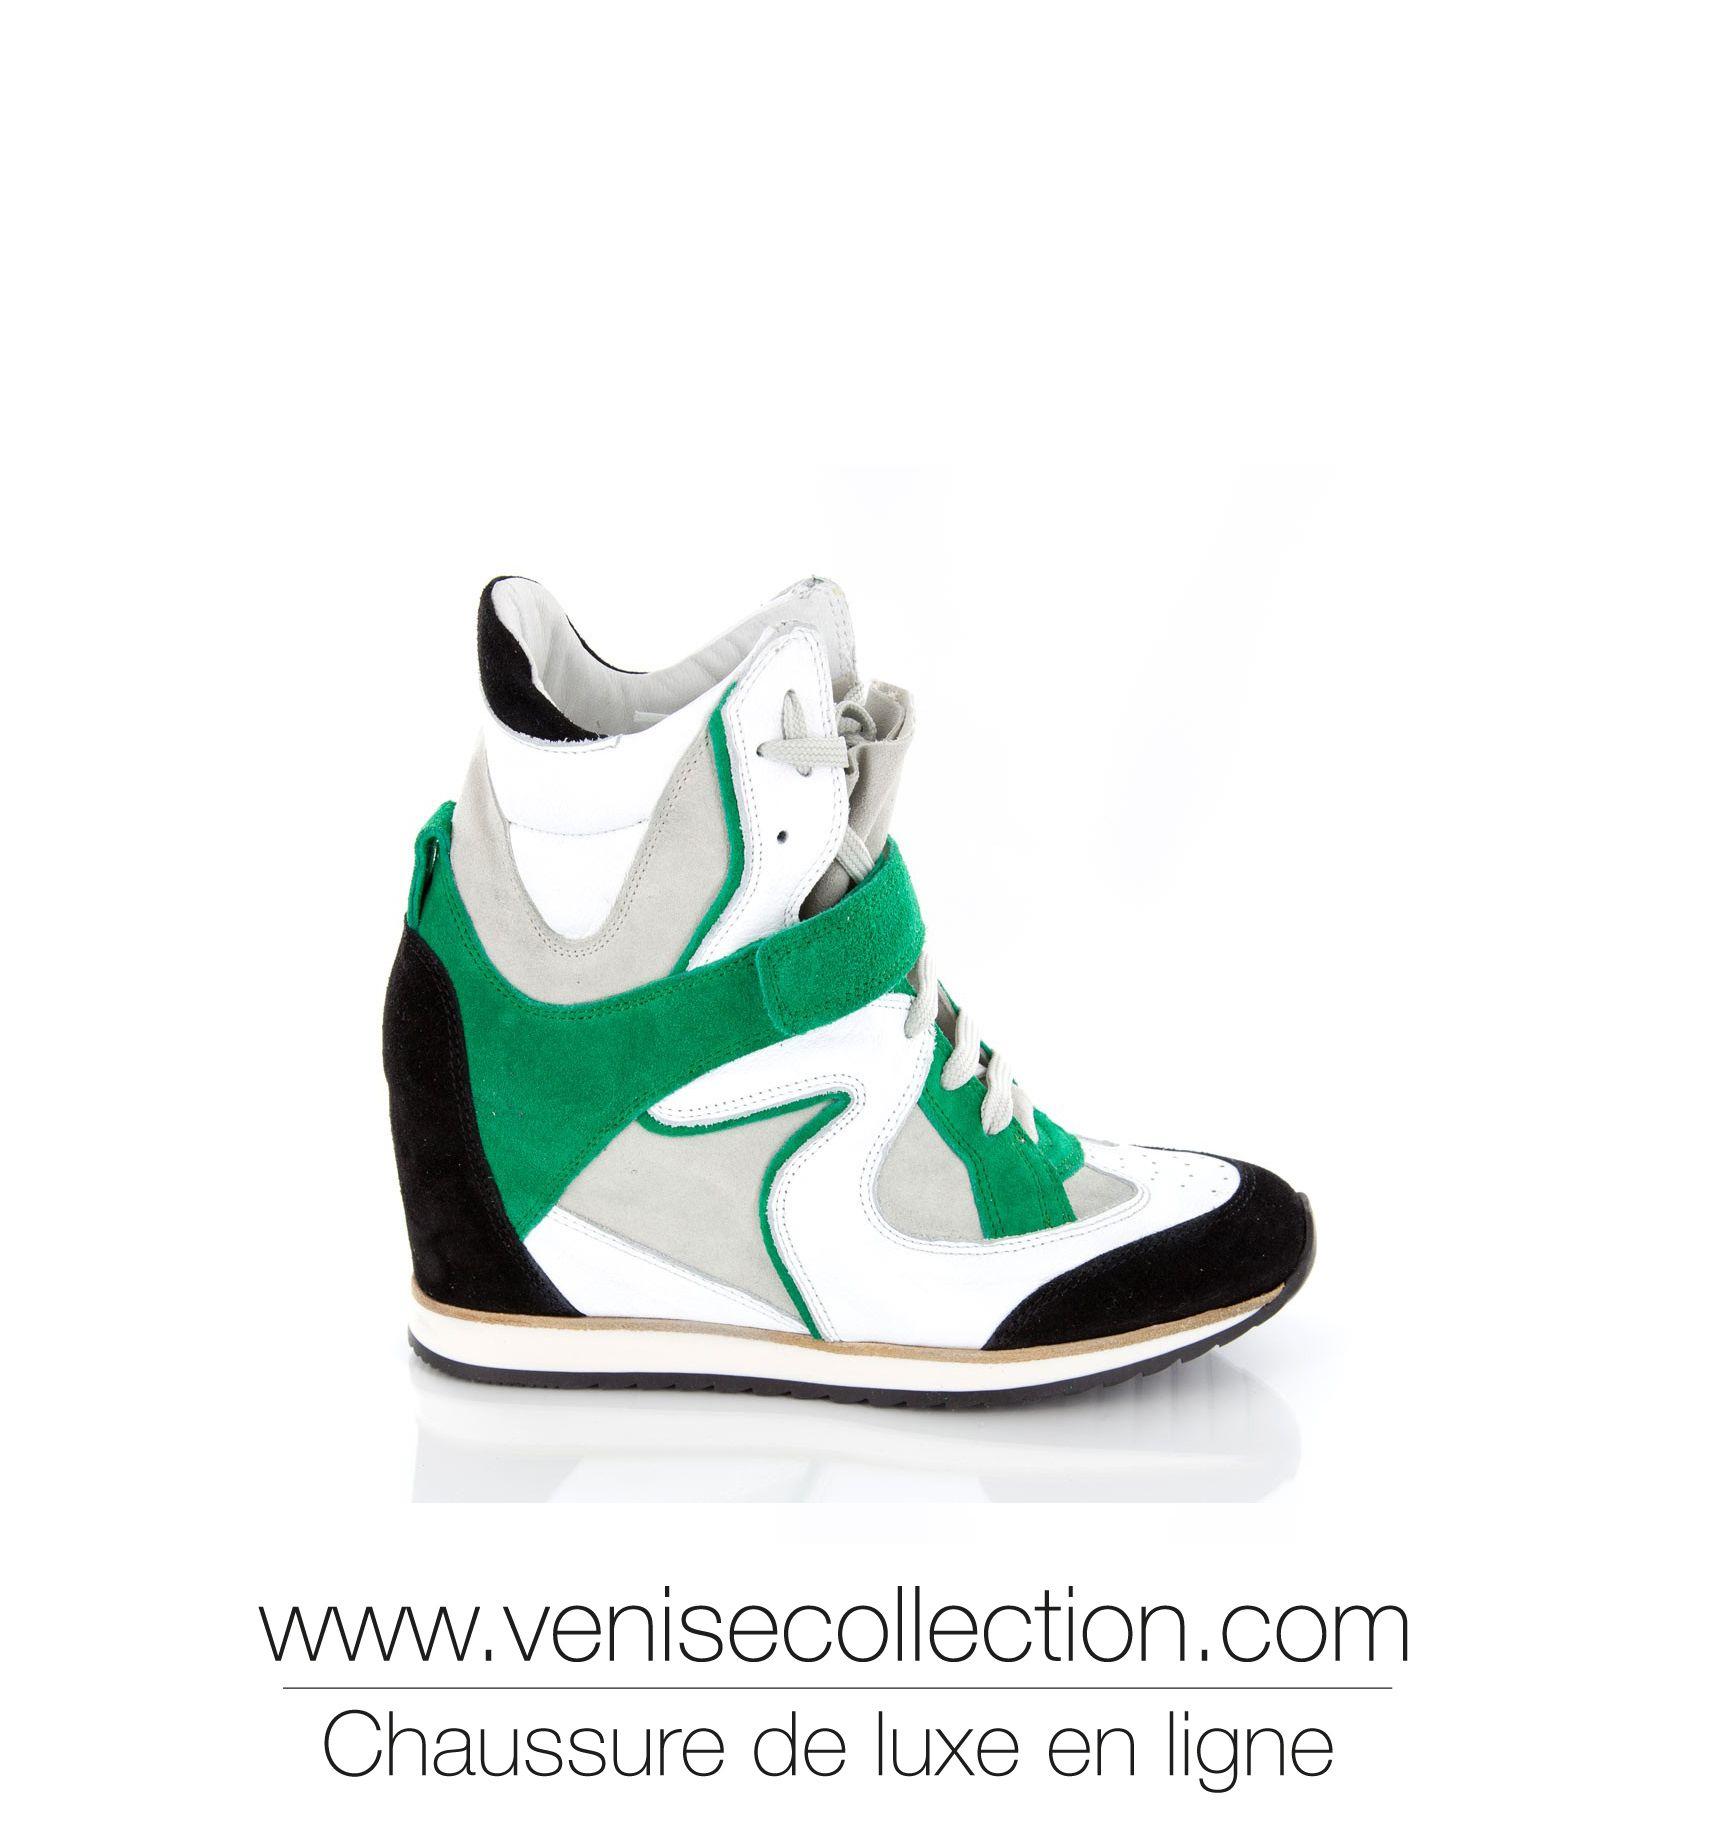 98d60e89bb3 Très tendance. http   www.venisecollection.com fr chaussures-femme-luxe  basket-de-luxe elena-iachi-basket-marta-chaussure-femme.html